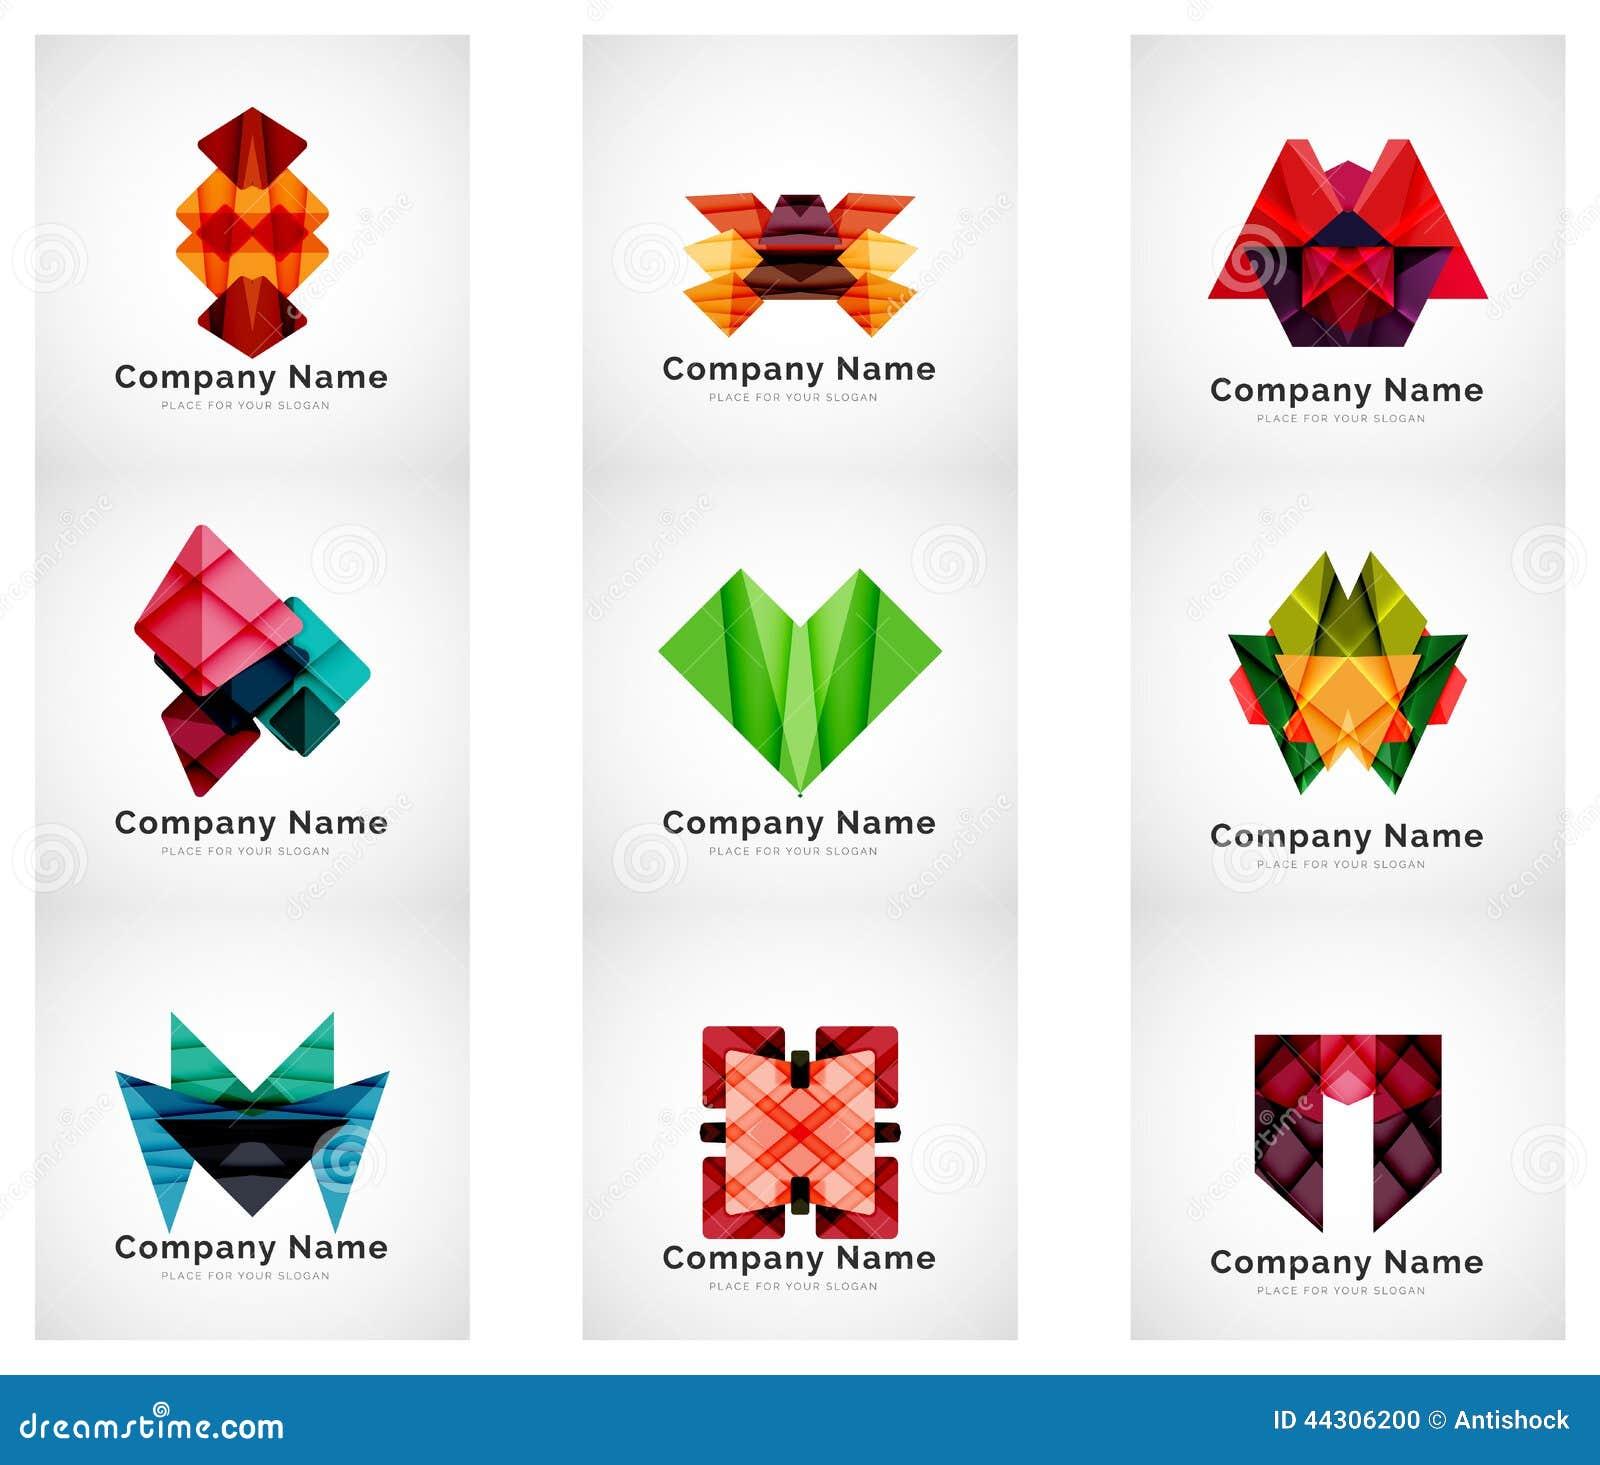 Company logos, paper geometric icon set